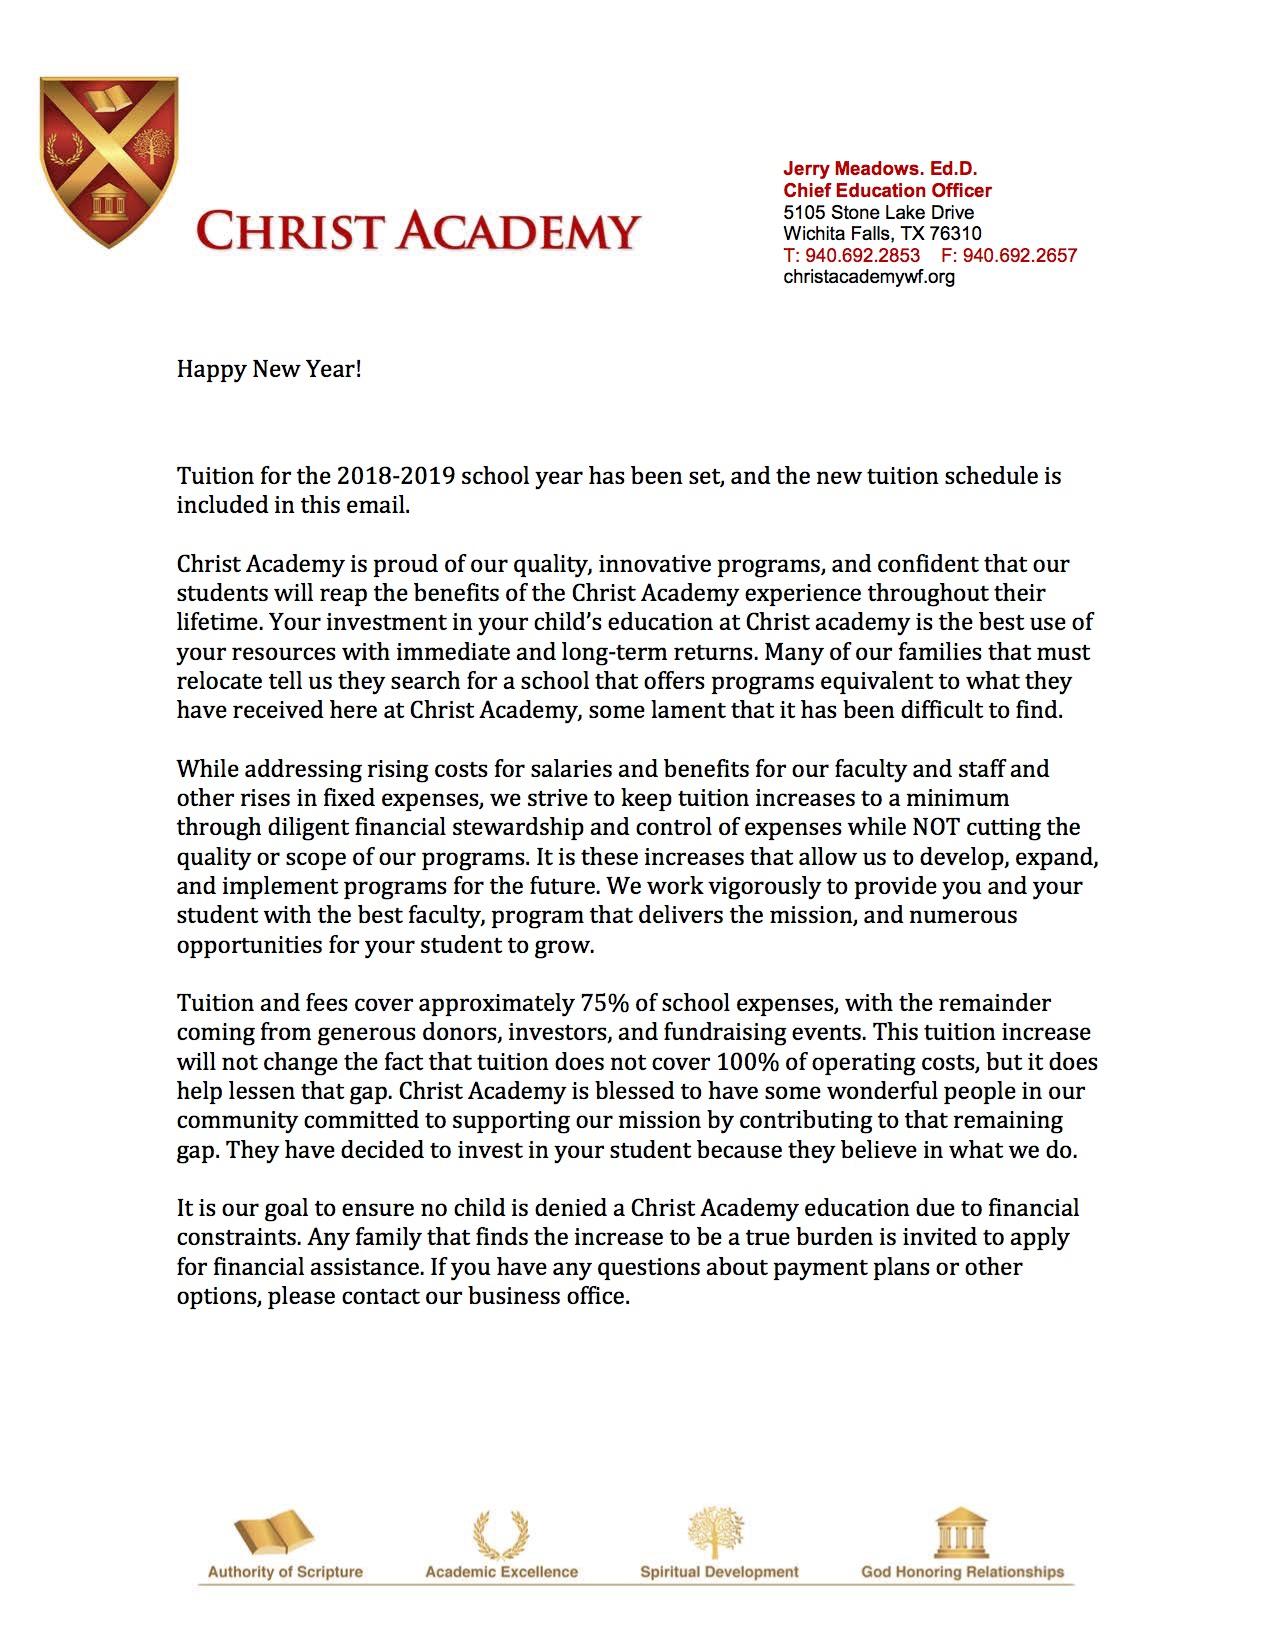 2018 - 2019 Tuition Letter.jpg